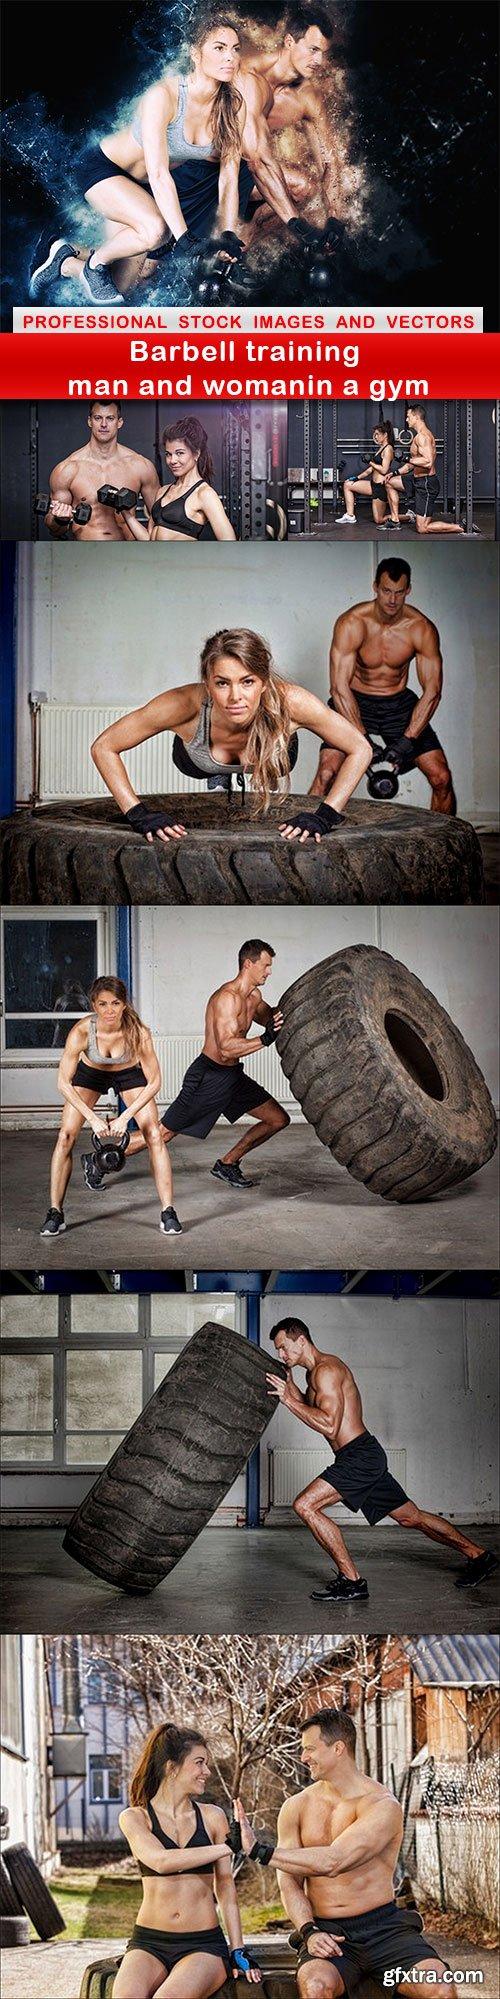 Barbell training man and womanin a gym - 7 UHQ JPEG